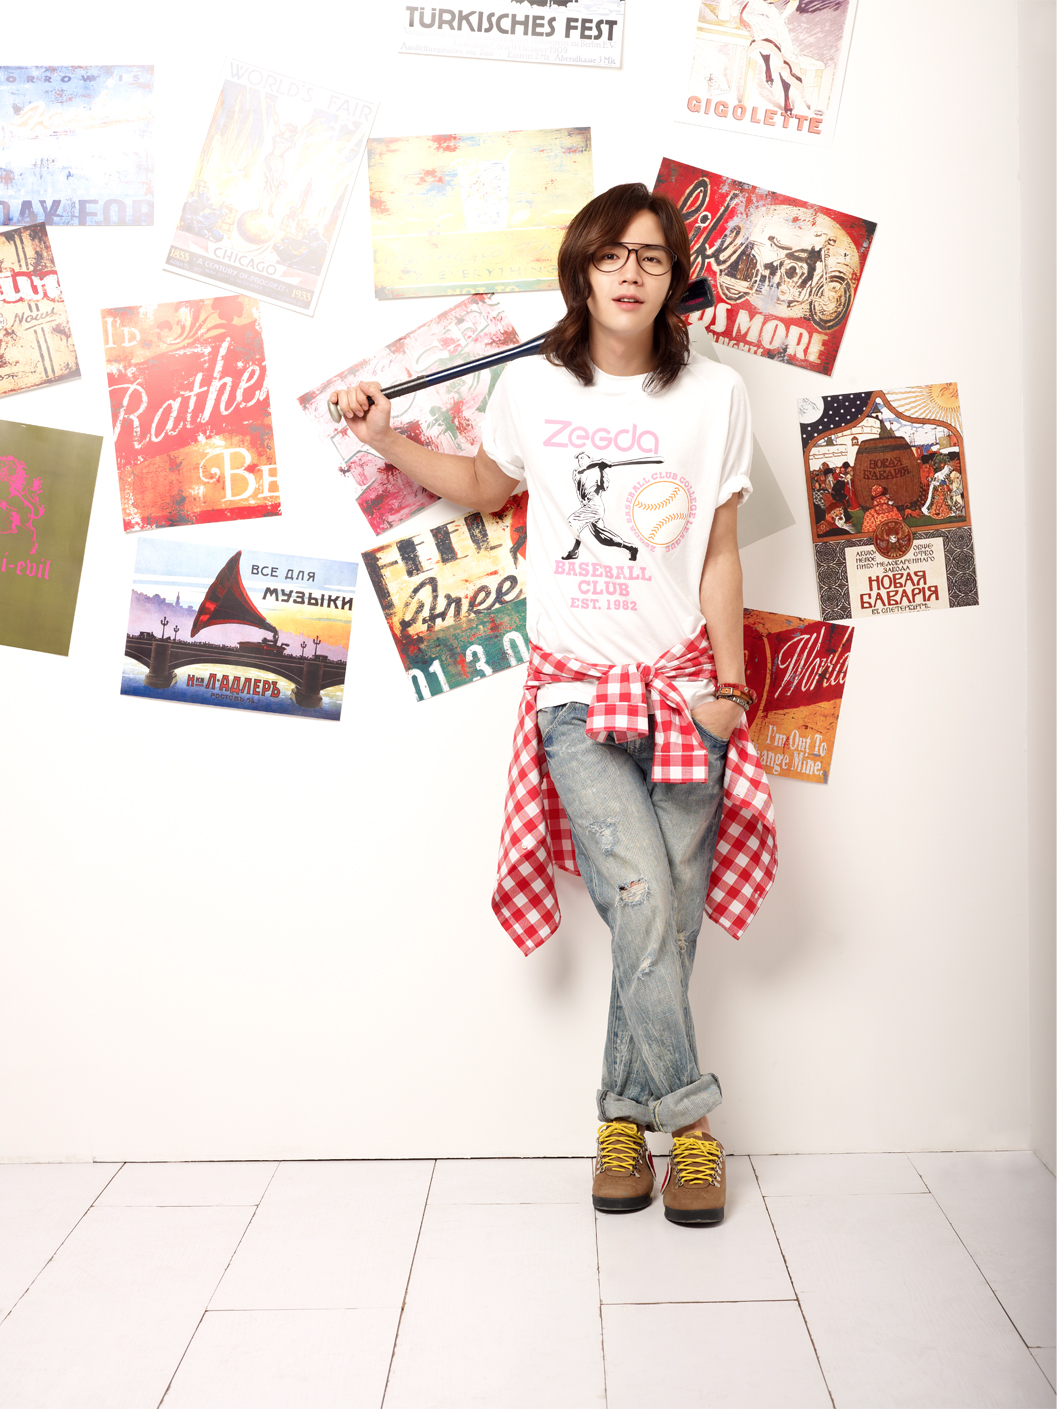 http://korean-cute.sosugary.com/albums/userpics/10001/1294808512_201101121402273324203401_0.jpg